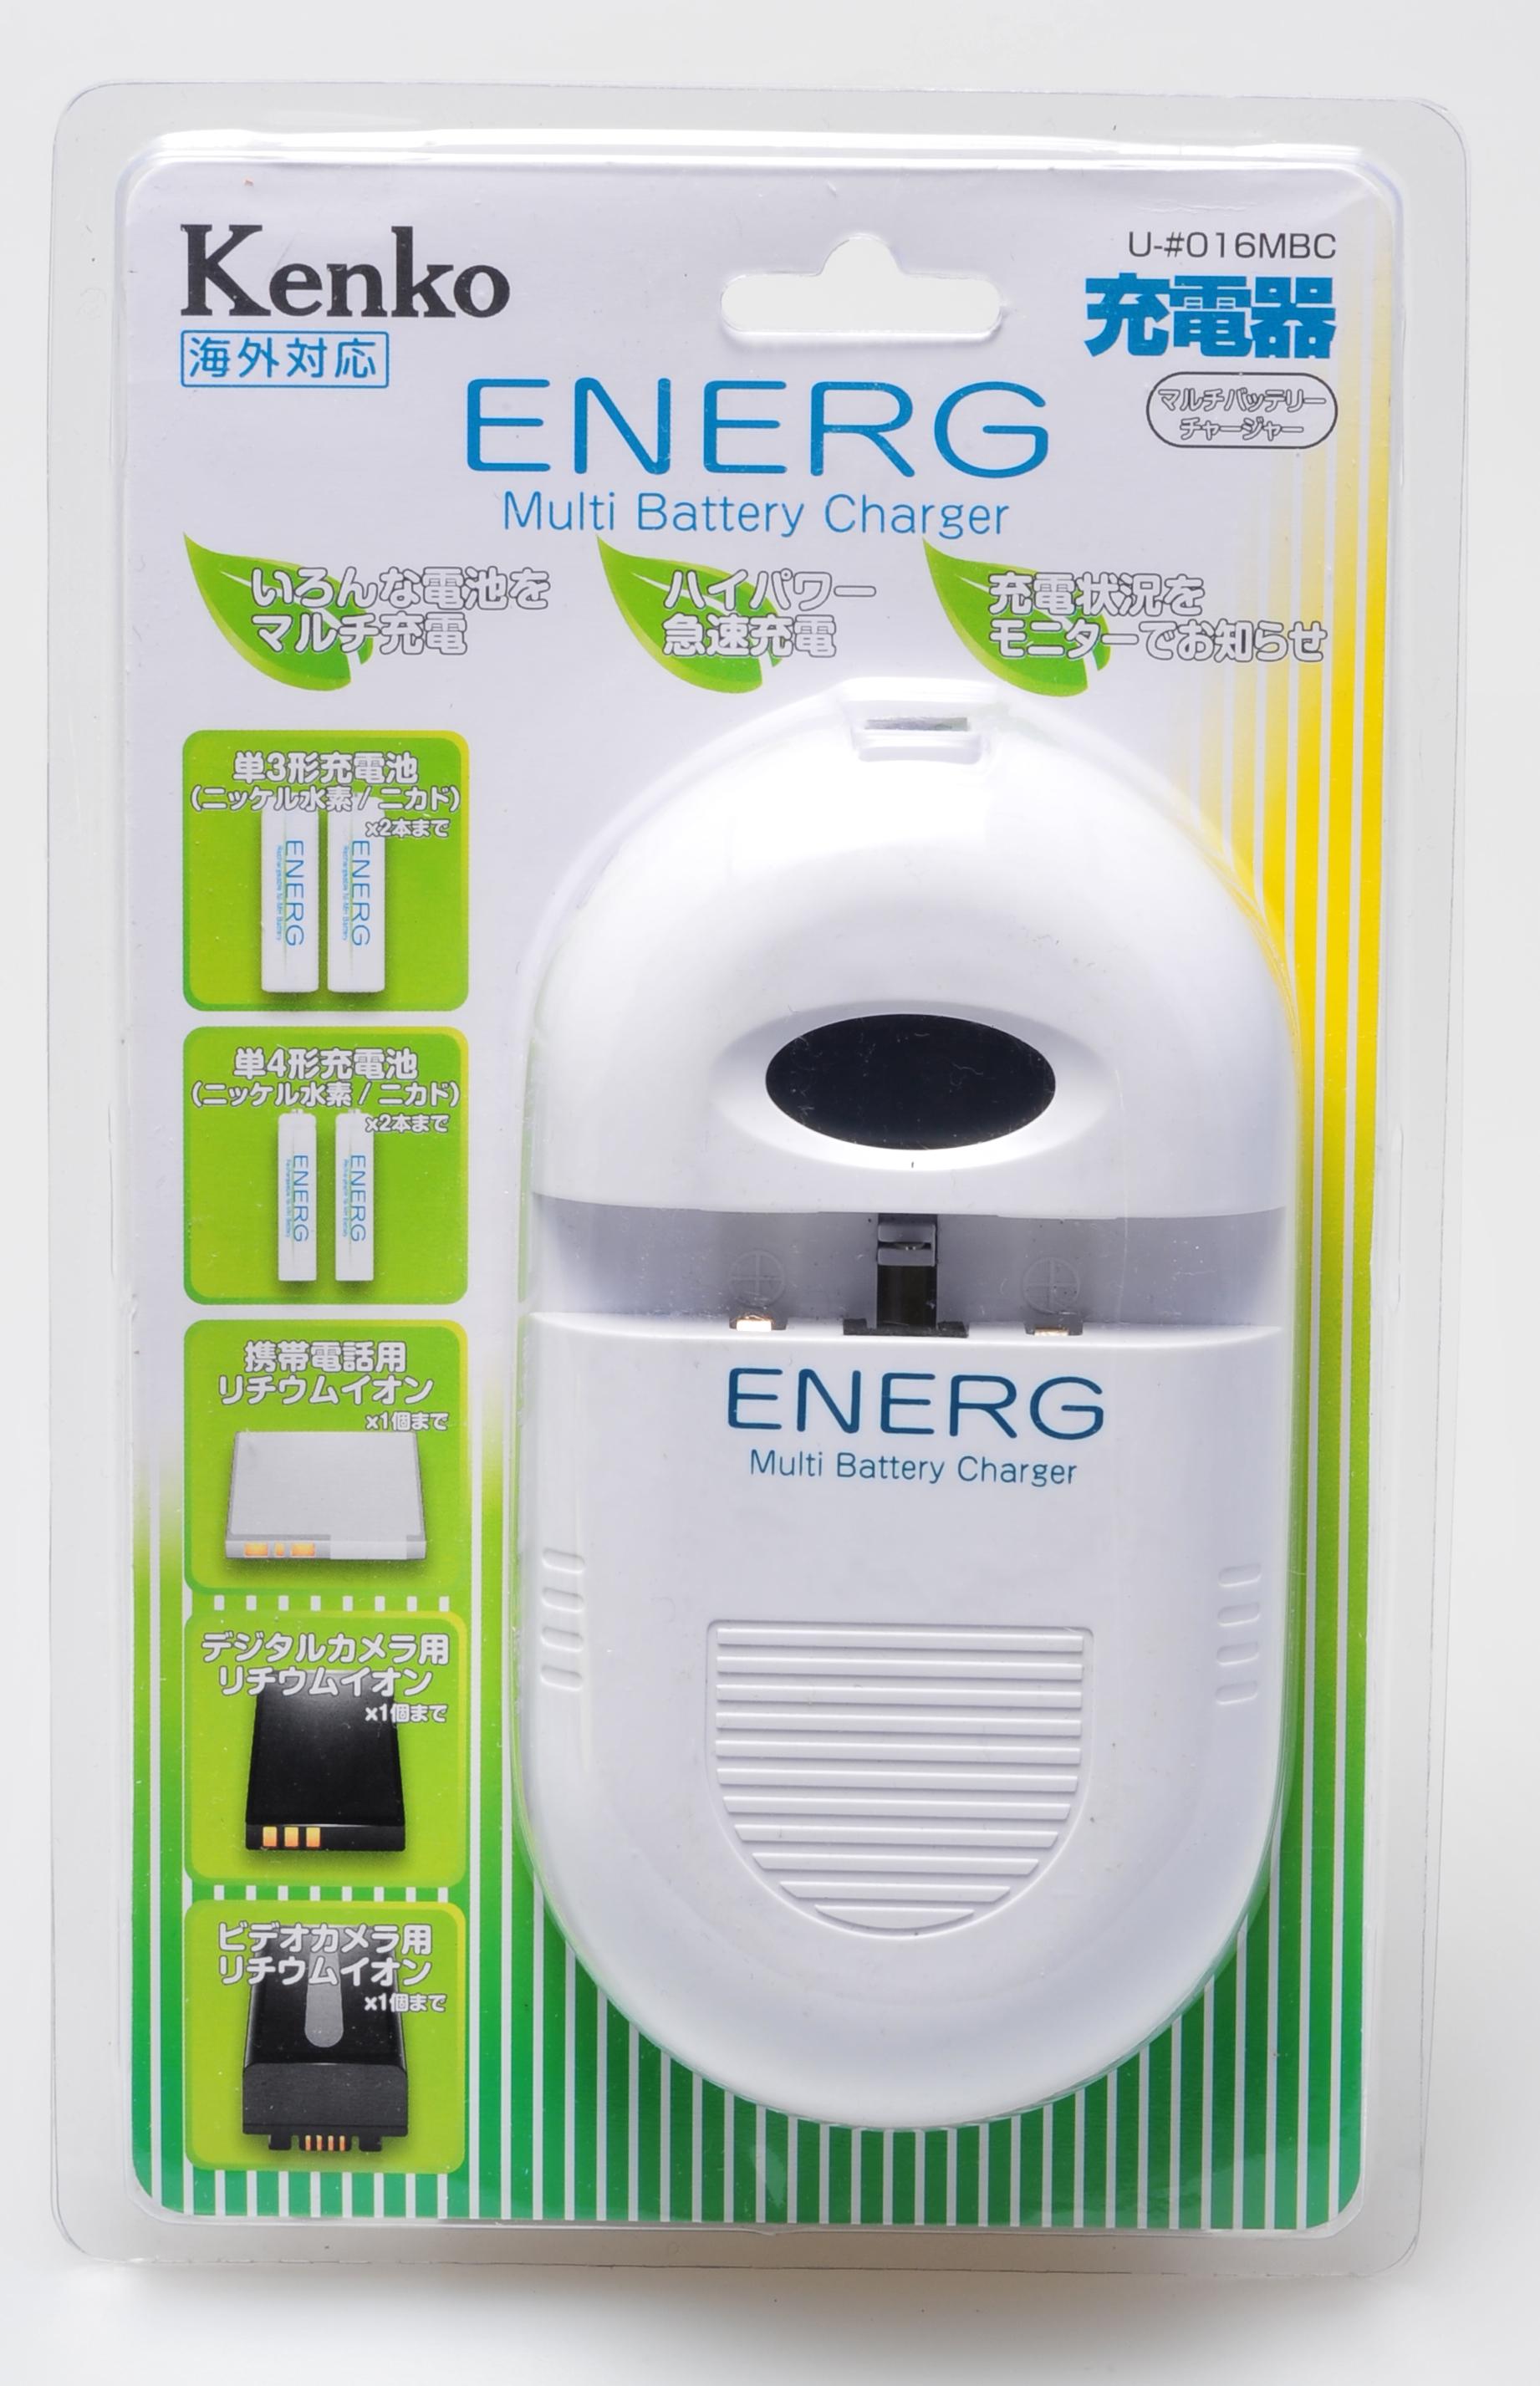 ENERG U-#016MBC �ޥ���Хåƥ���㡼���㡼